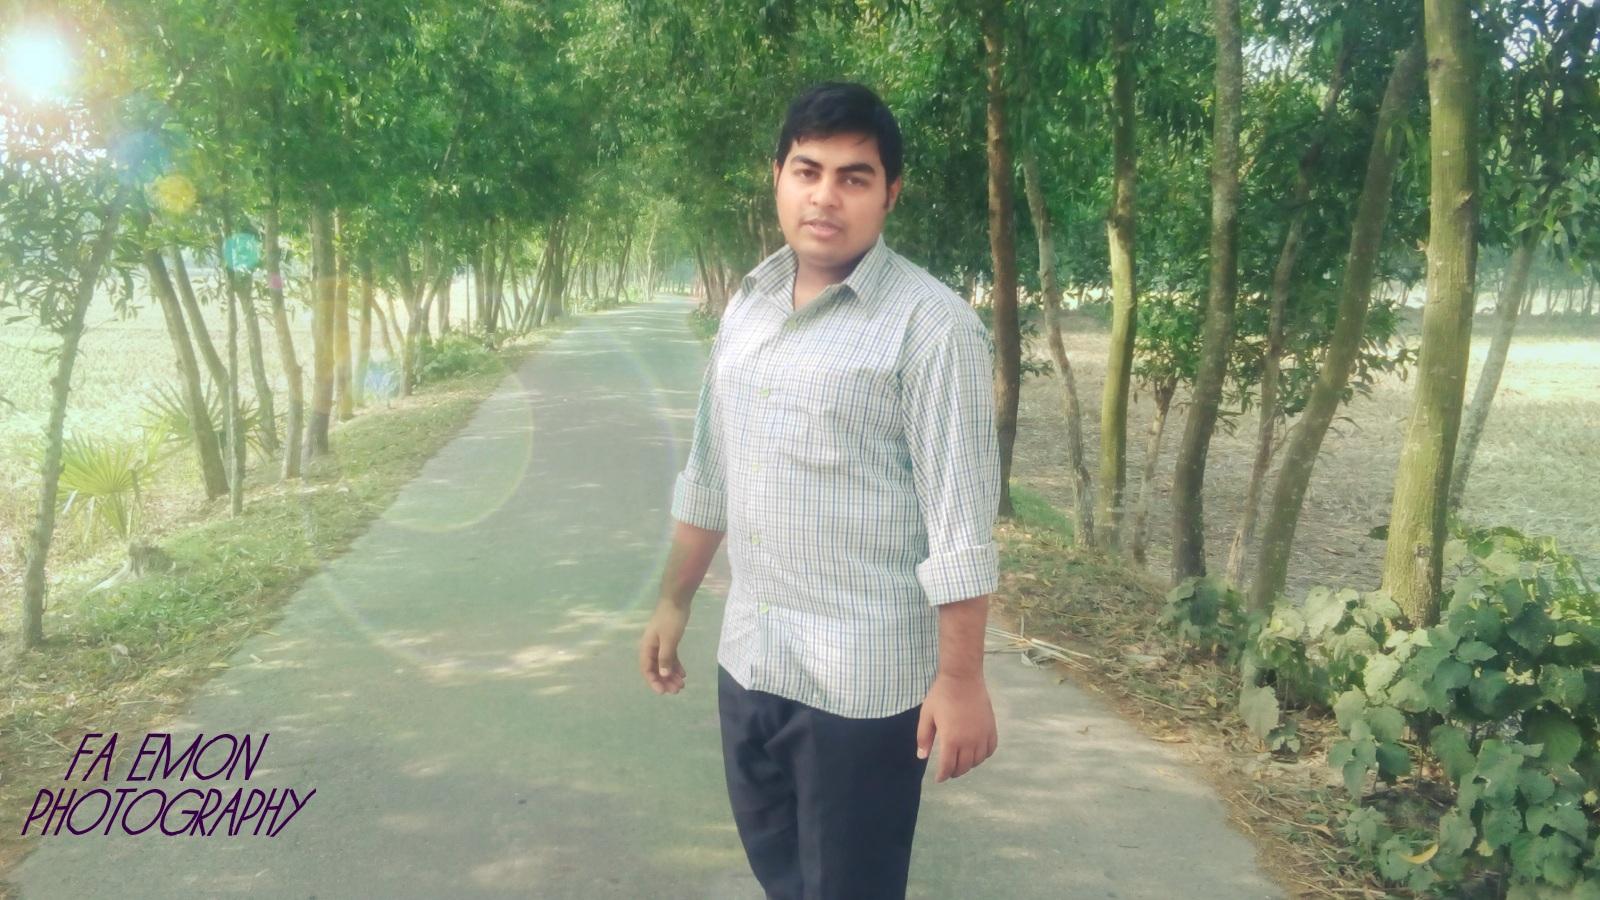 Fardin Ahsan Emon